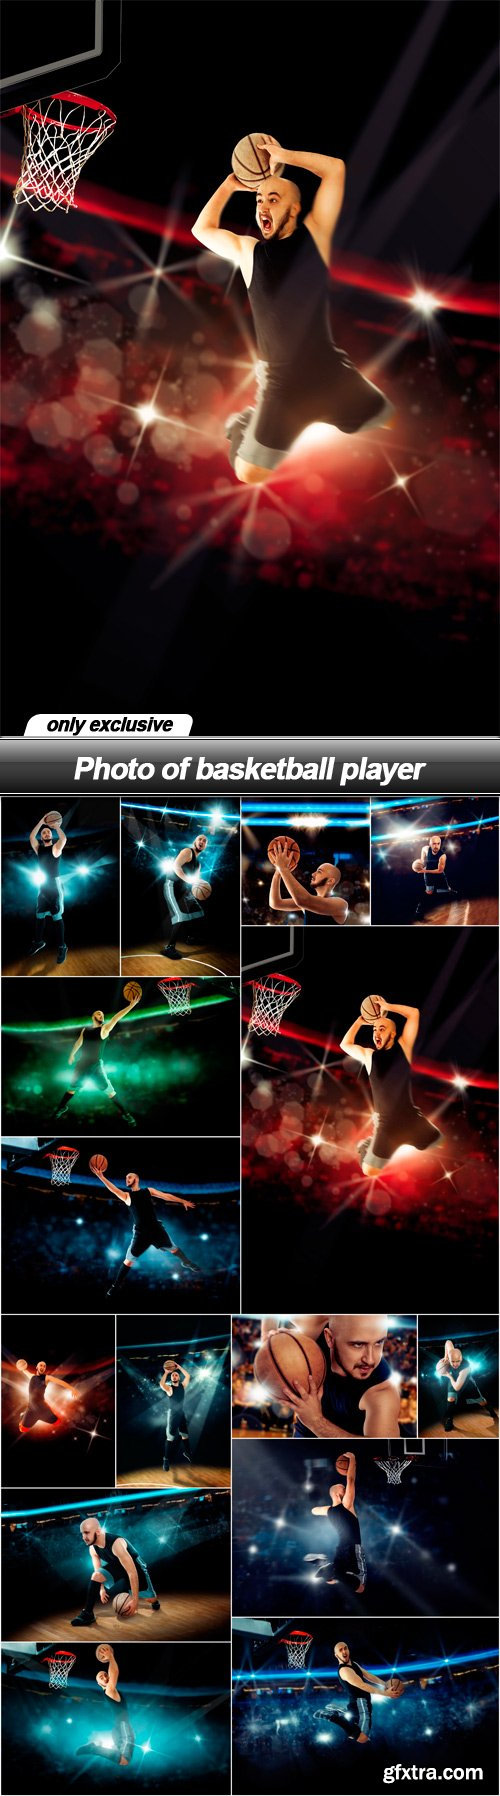 Photo of basketball player - 15 UHQ JPEG